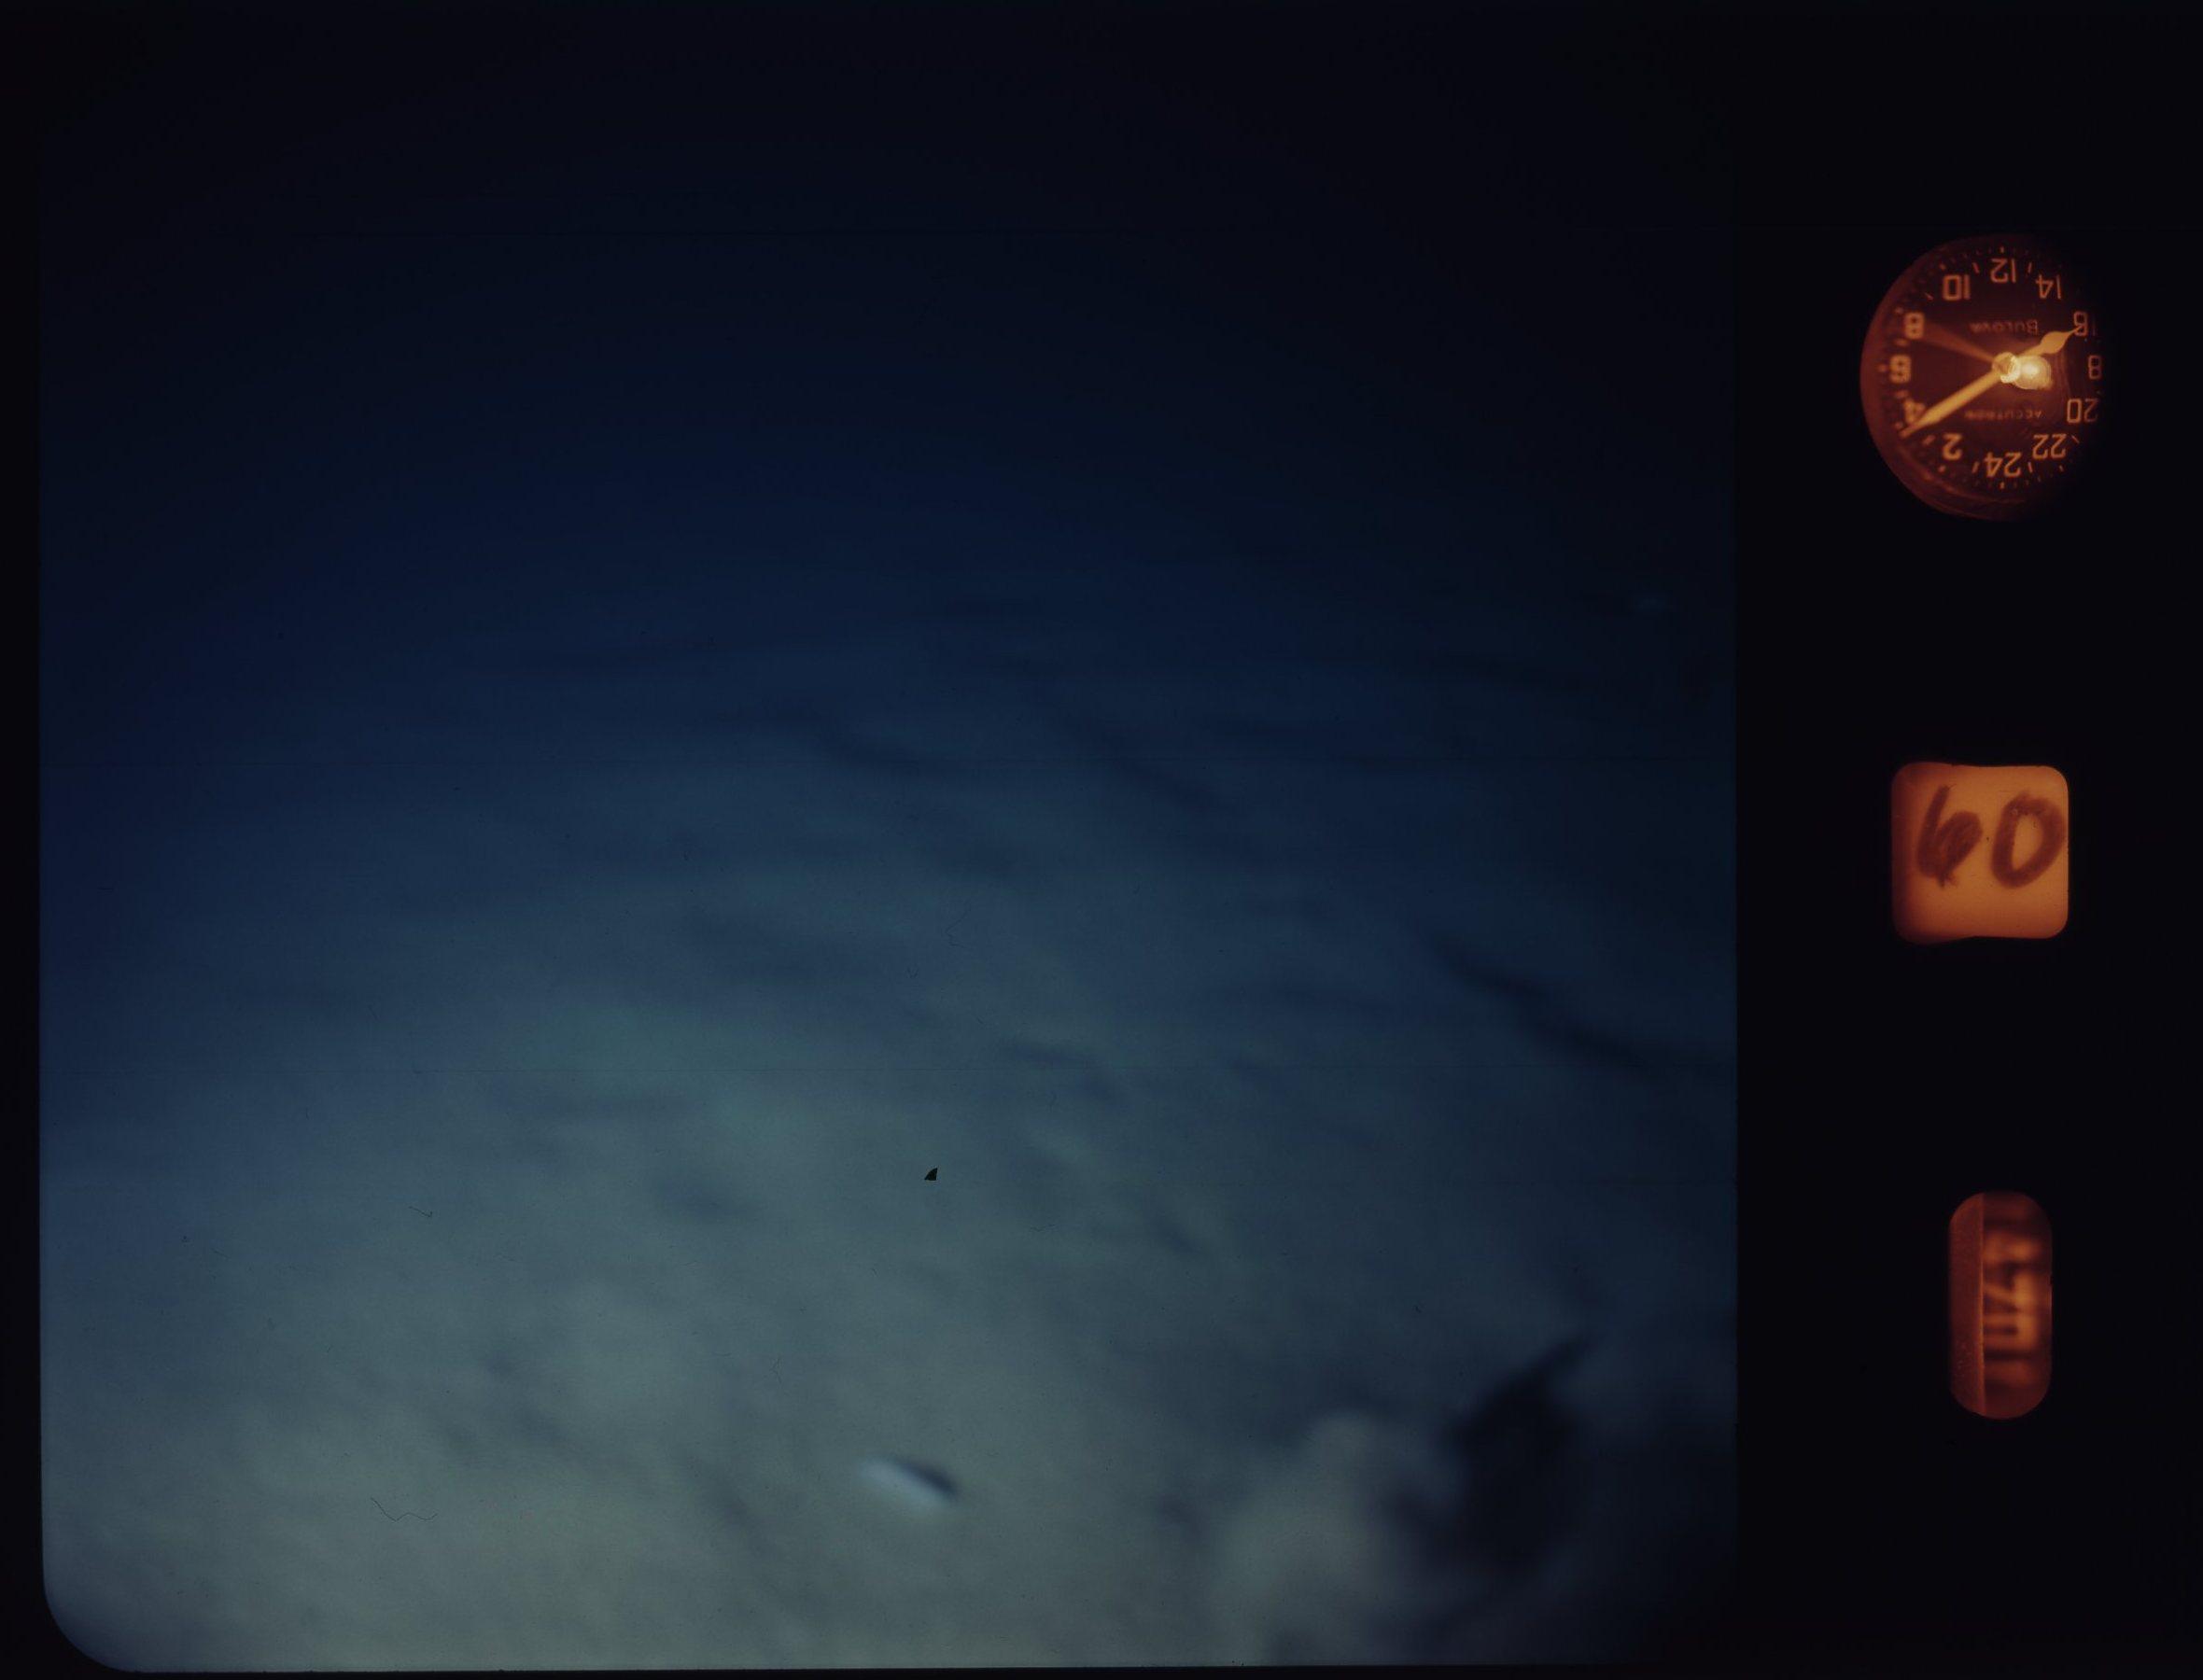 370-RCS_tow_60_image_247.jpg - ~140 km south of Nantucket